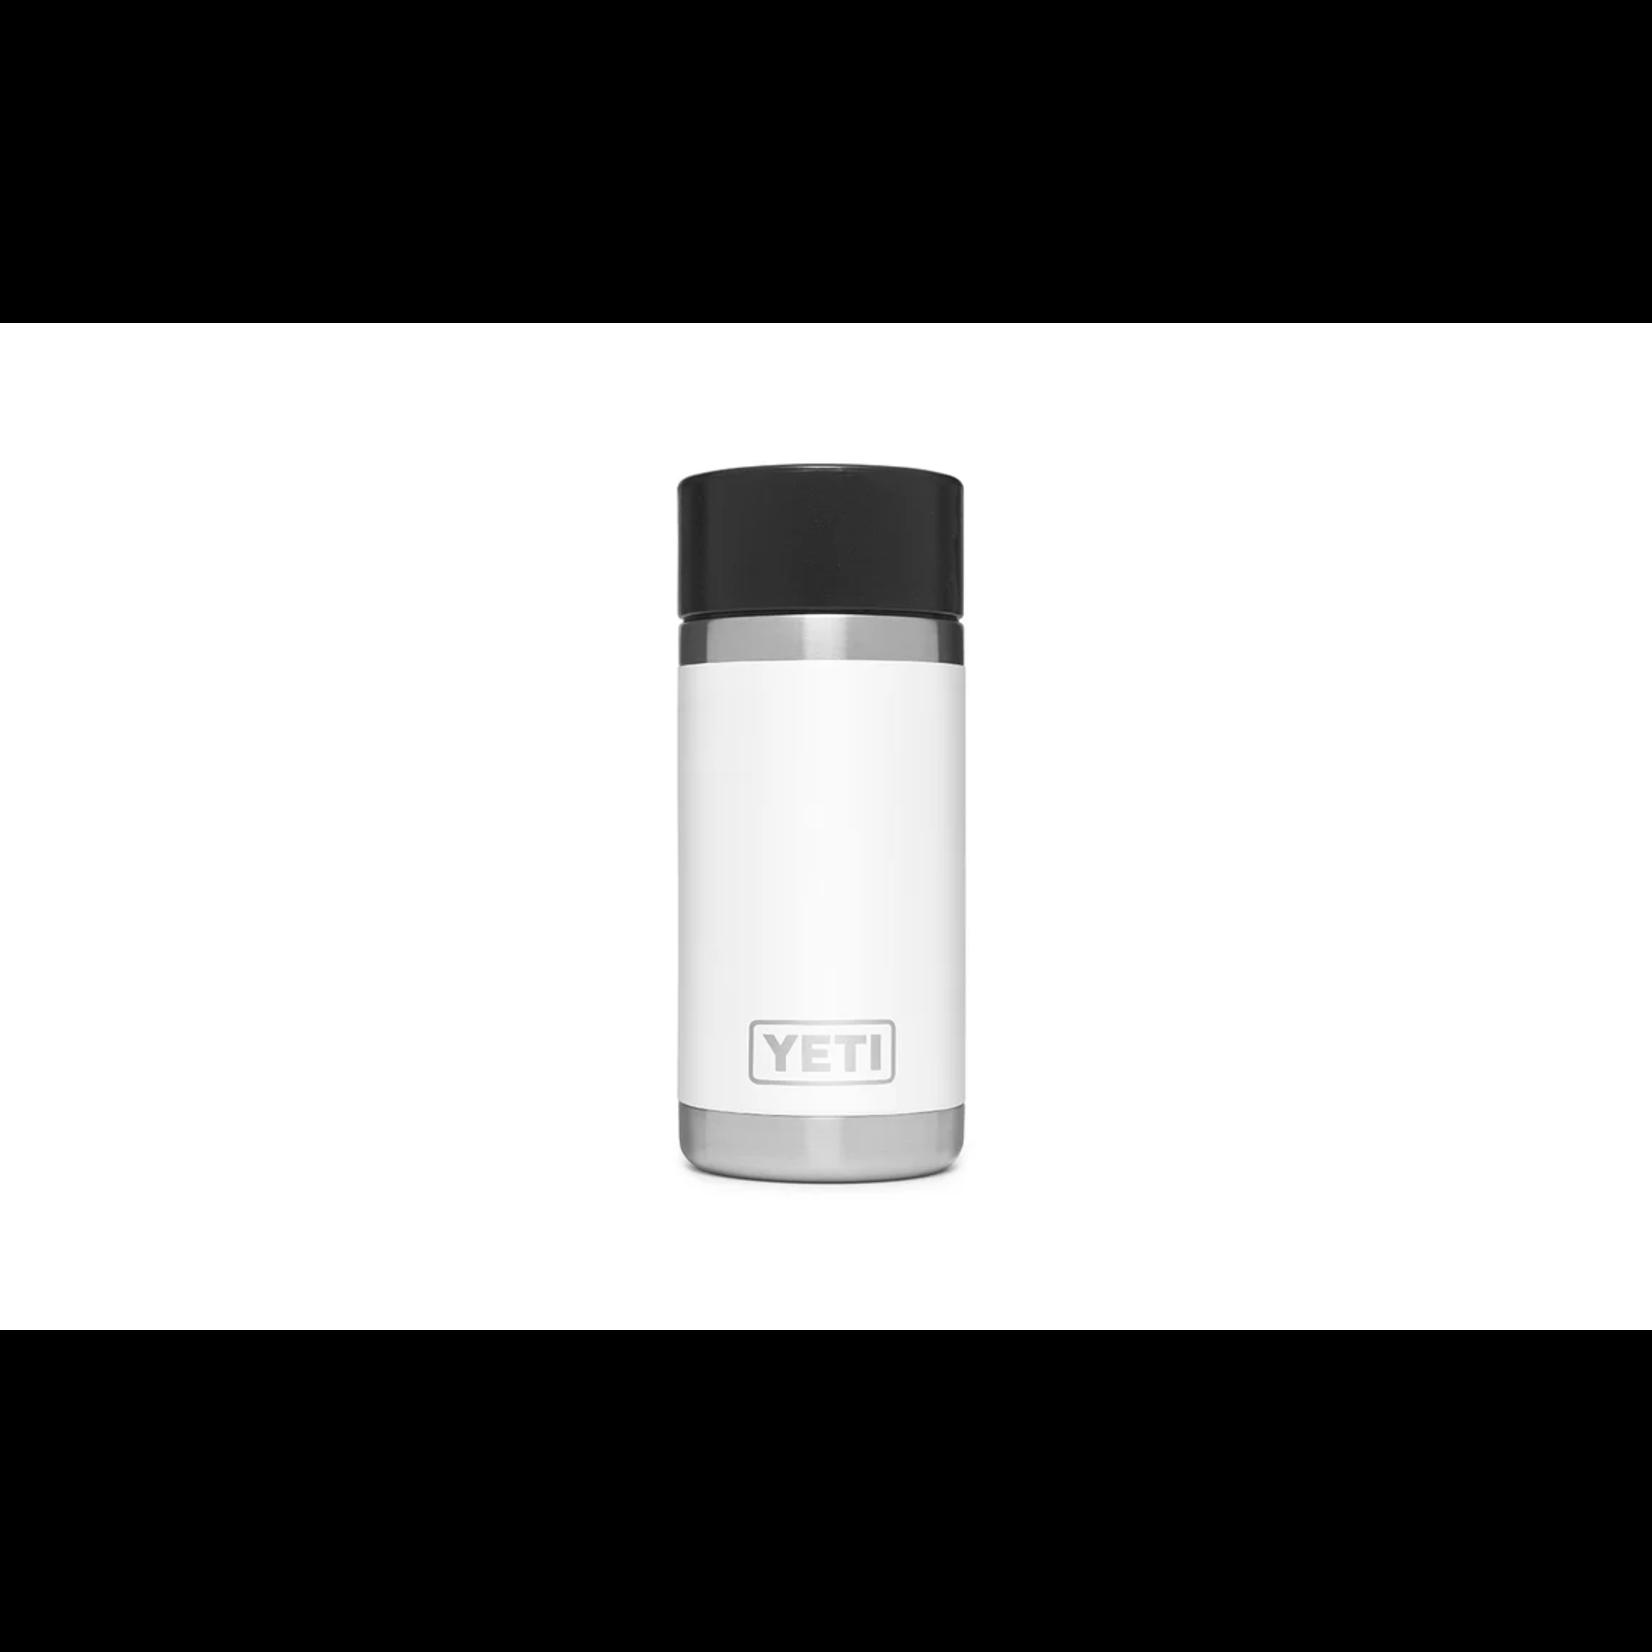 Yeti Rambler 12oz / 355ml Hot Shot Bottle